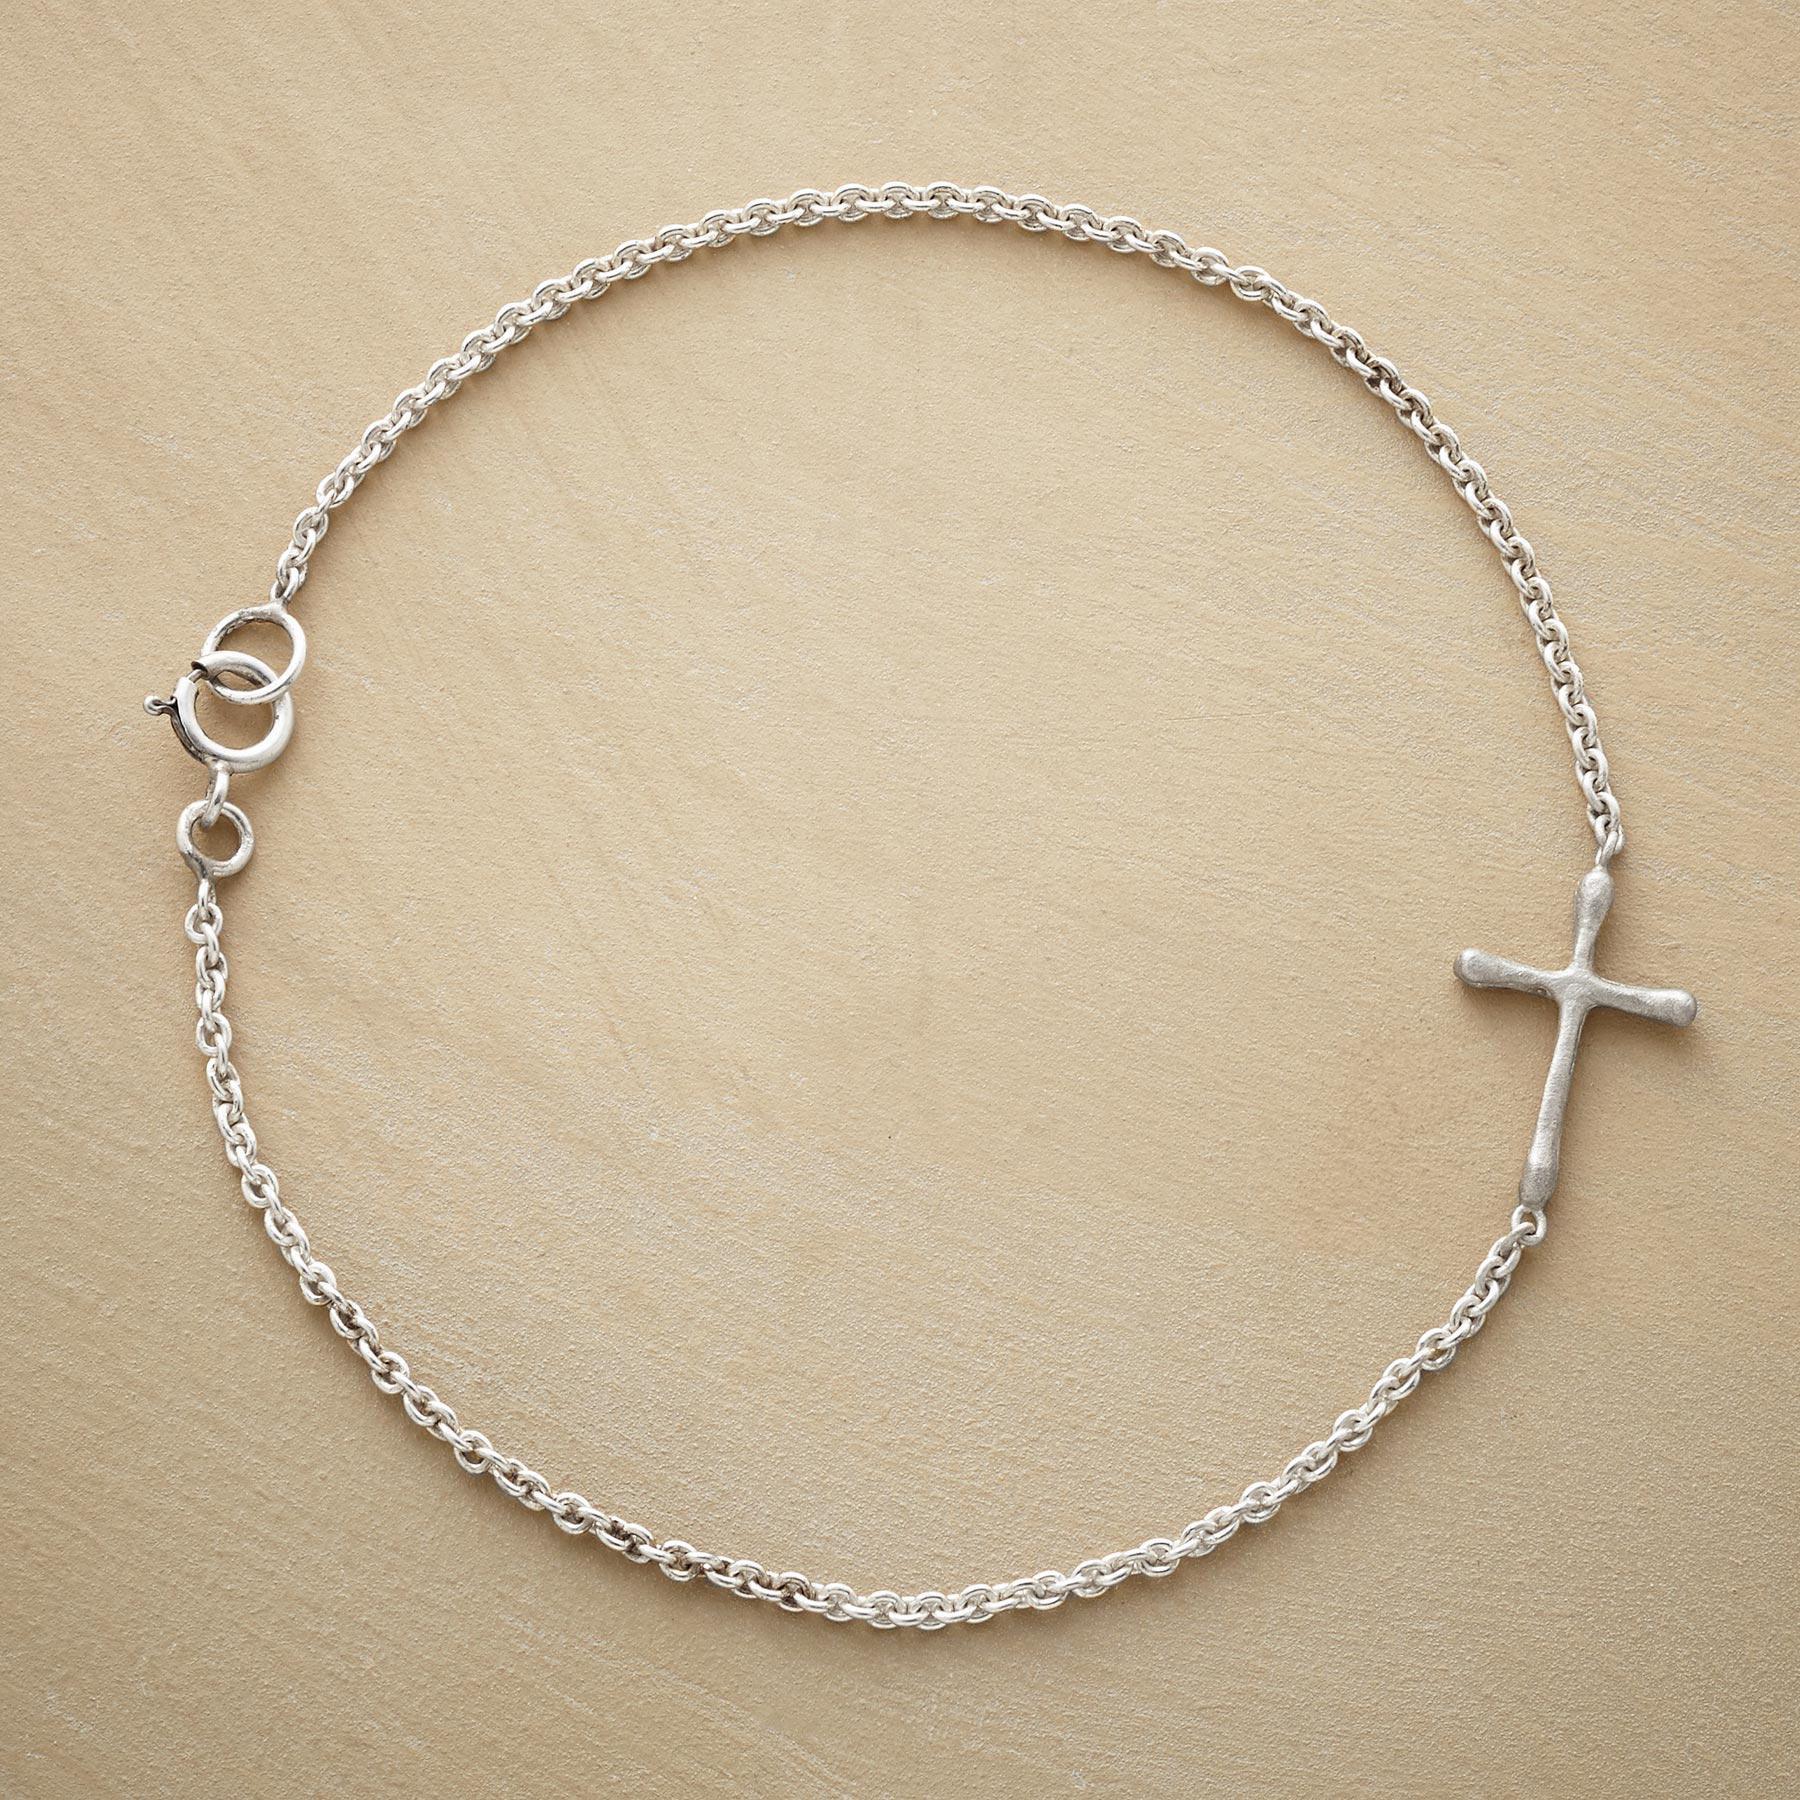 Sterling Silver Linked Cross Bracelet